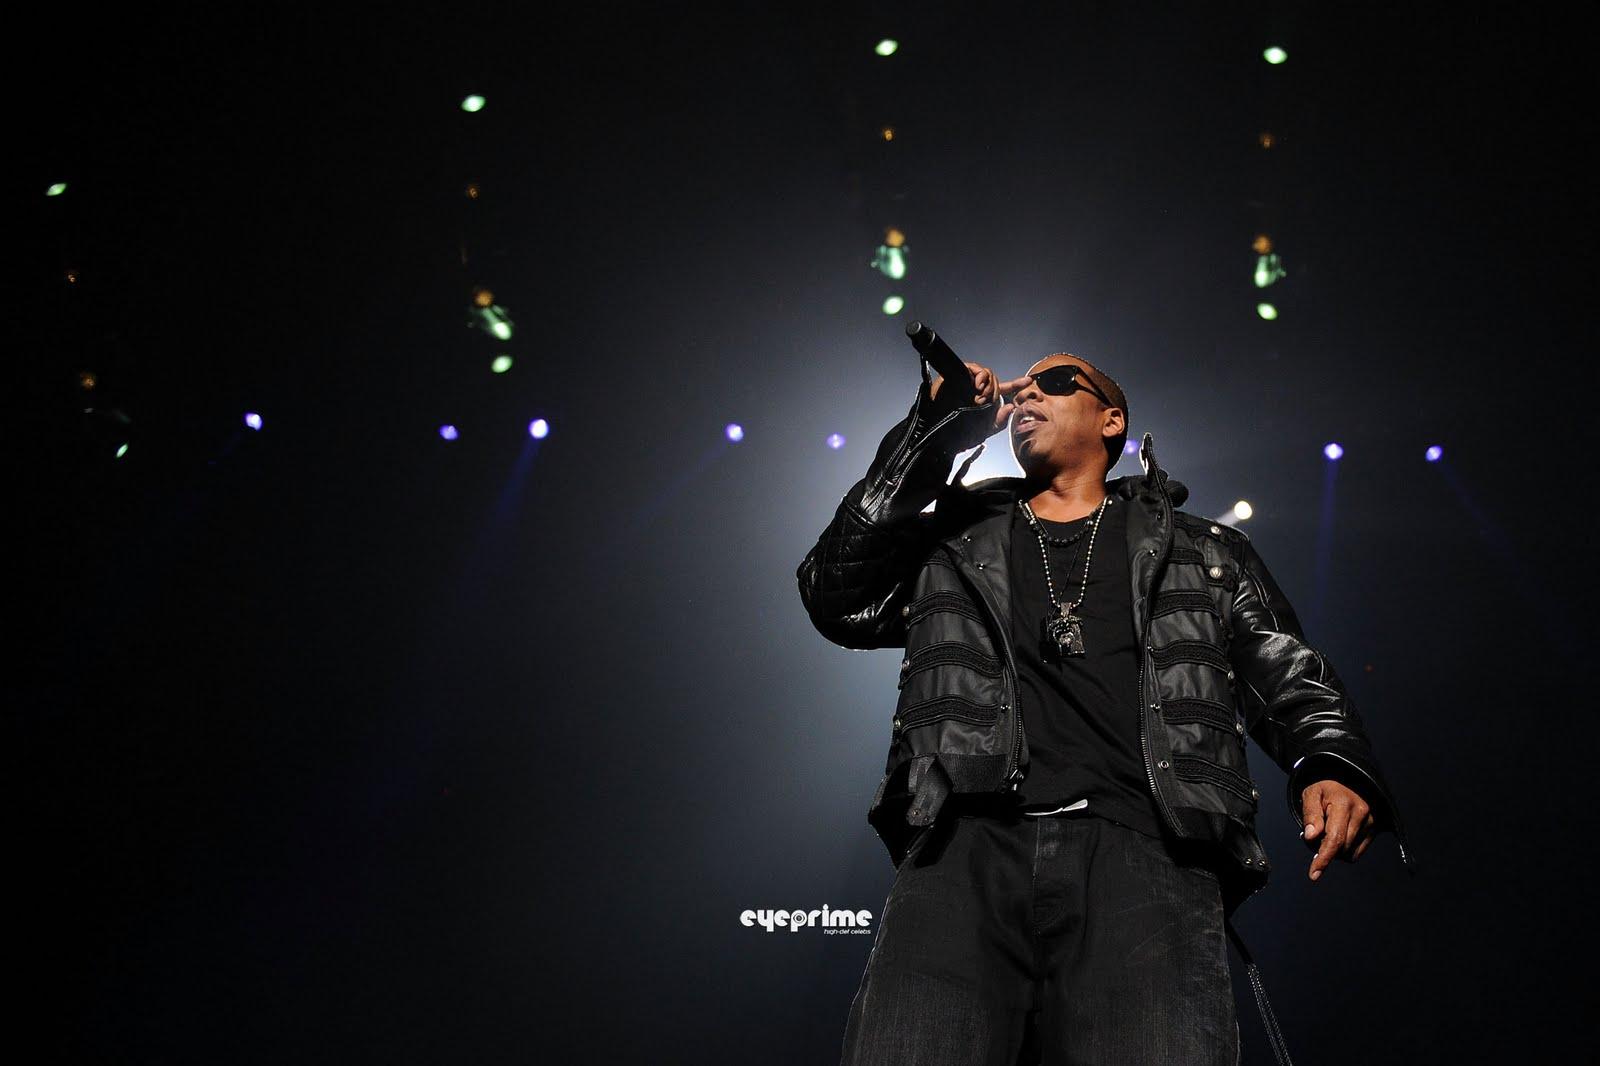 http://1.bp.blogspot.com/_6A8j2EQmANk/S8bi78a1tcI/AAAAAAAABdY/z0bBsjLL4KE/s1600/Jay-Z9.jpg